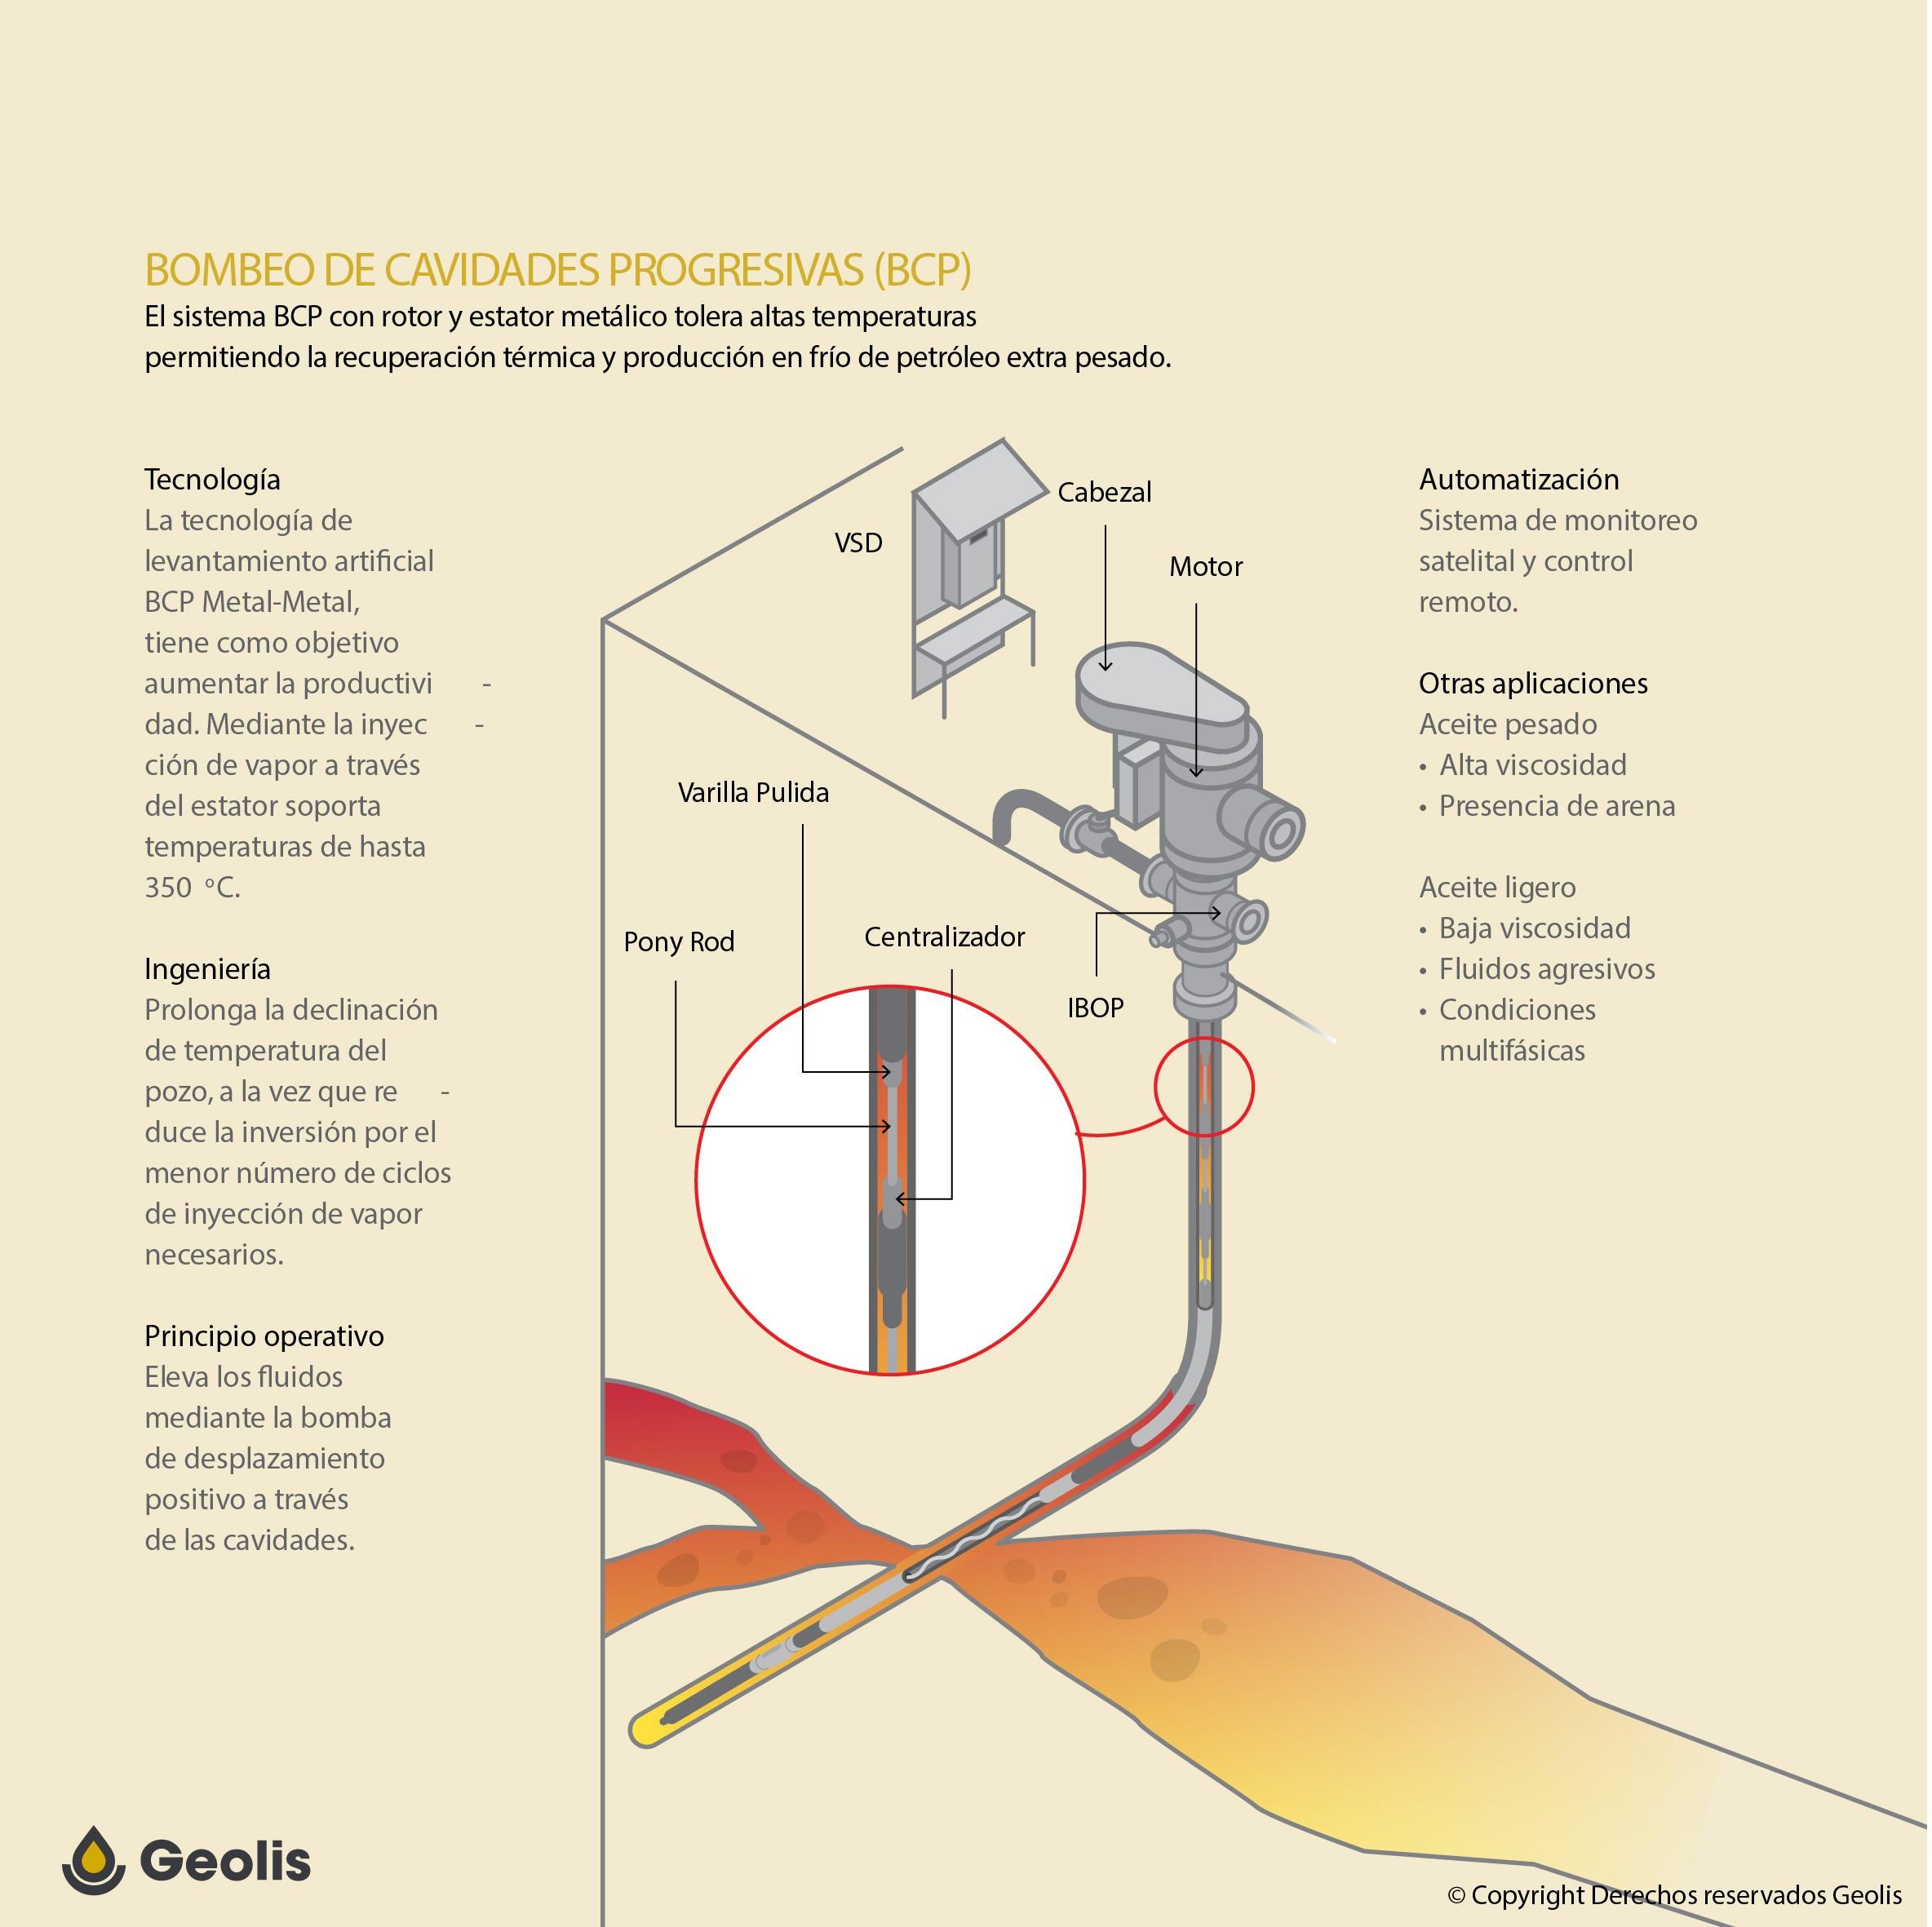 Infografía Bombeo cavidades Progresivas